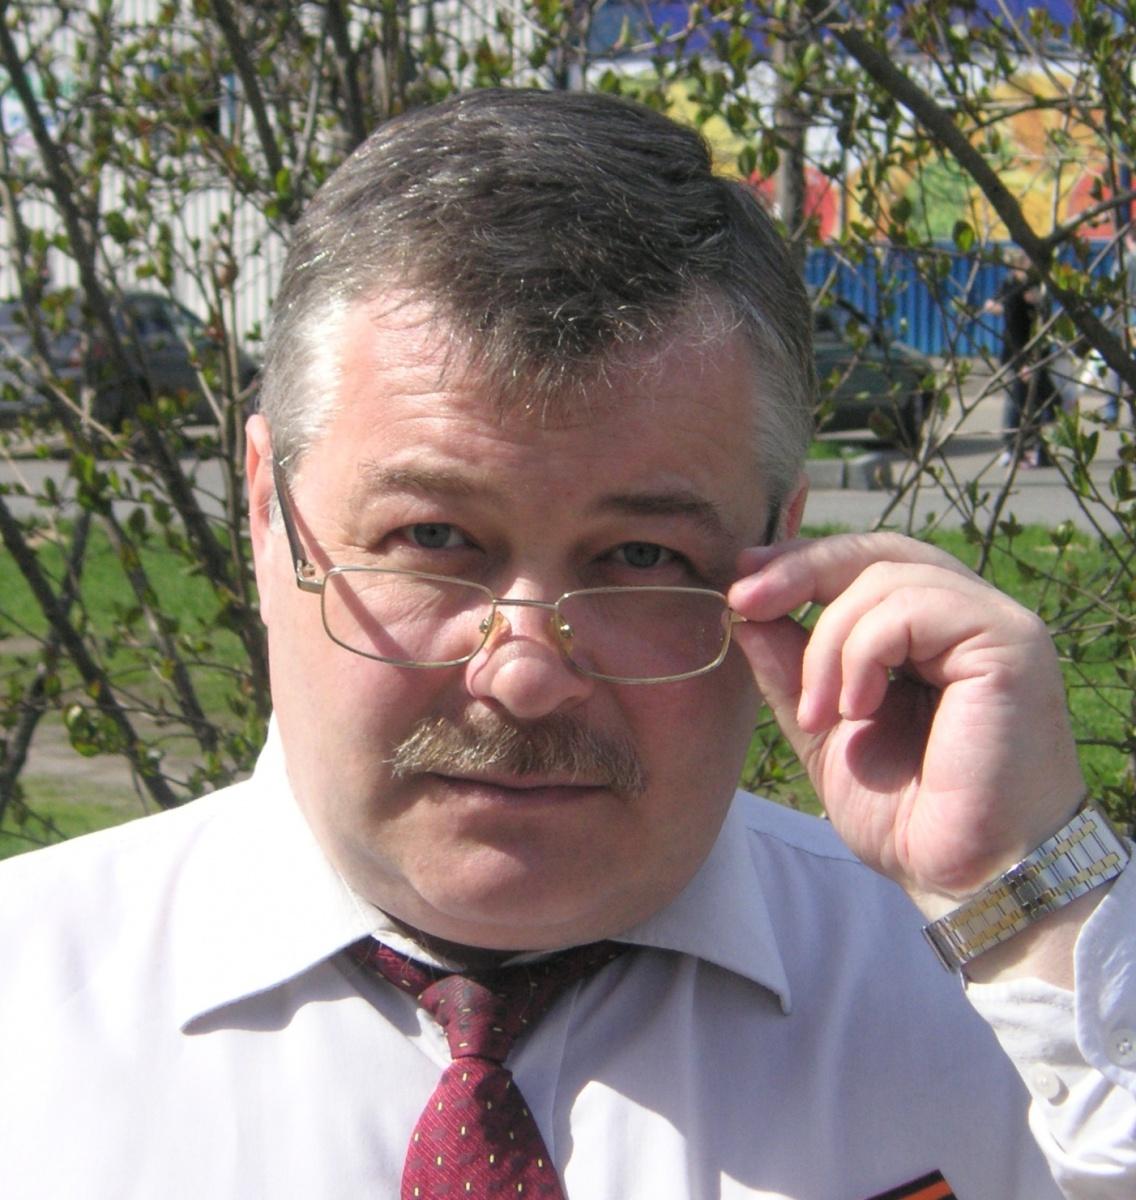 фото ЗакС политика Прототип Дукалиса пошел на выборы в МО «Дачное» самовыдвиженцем